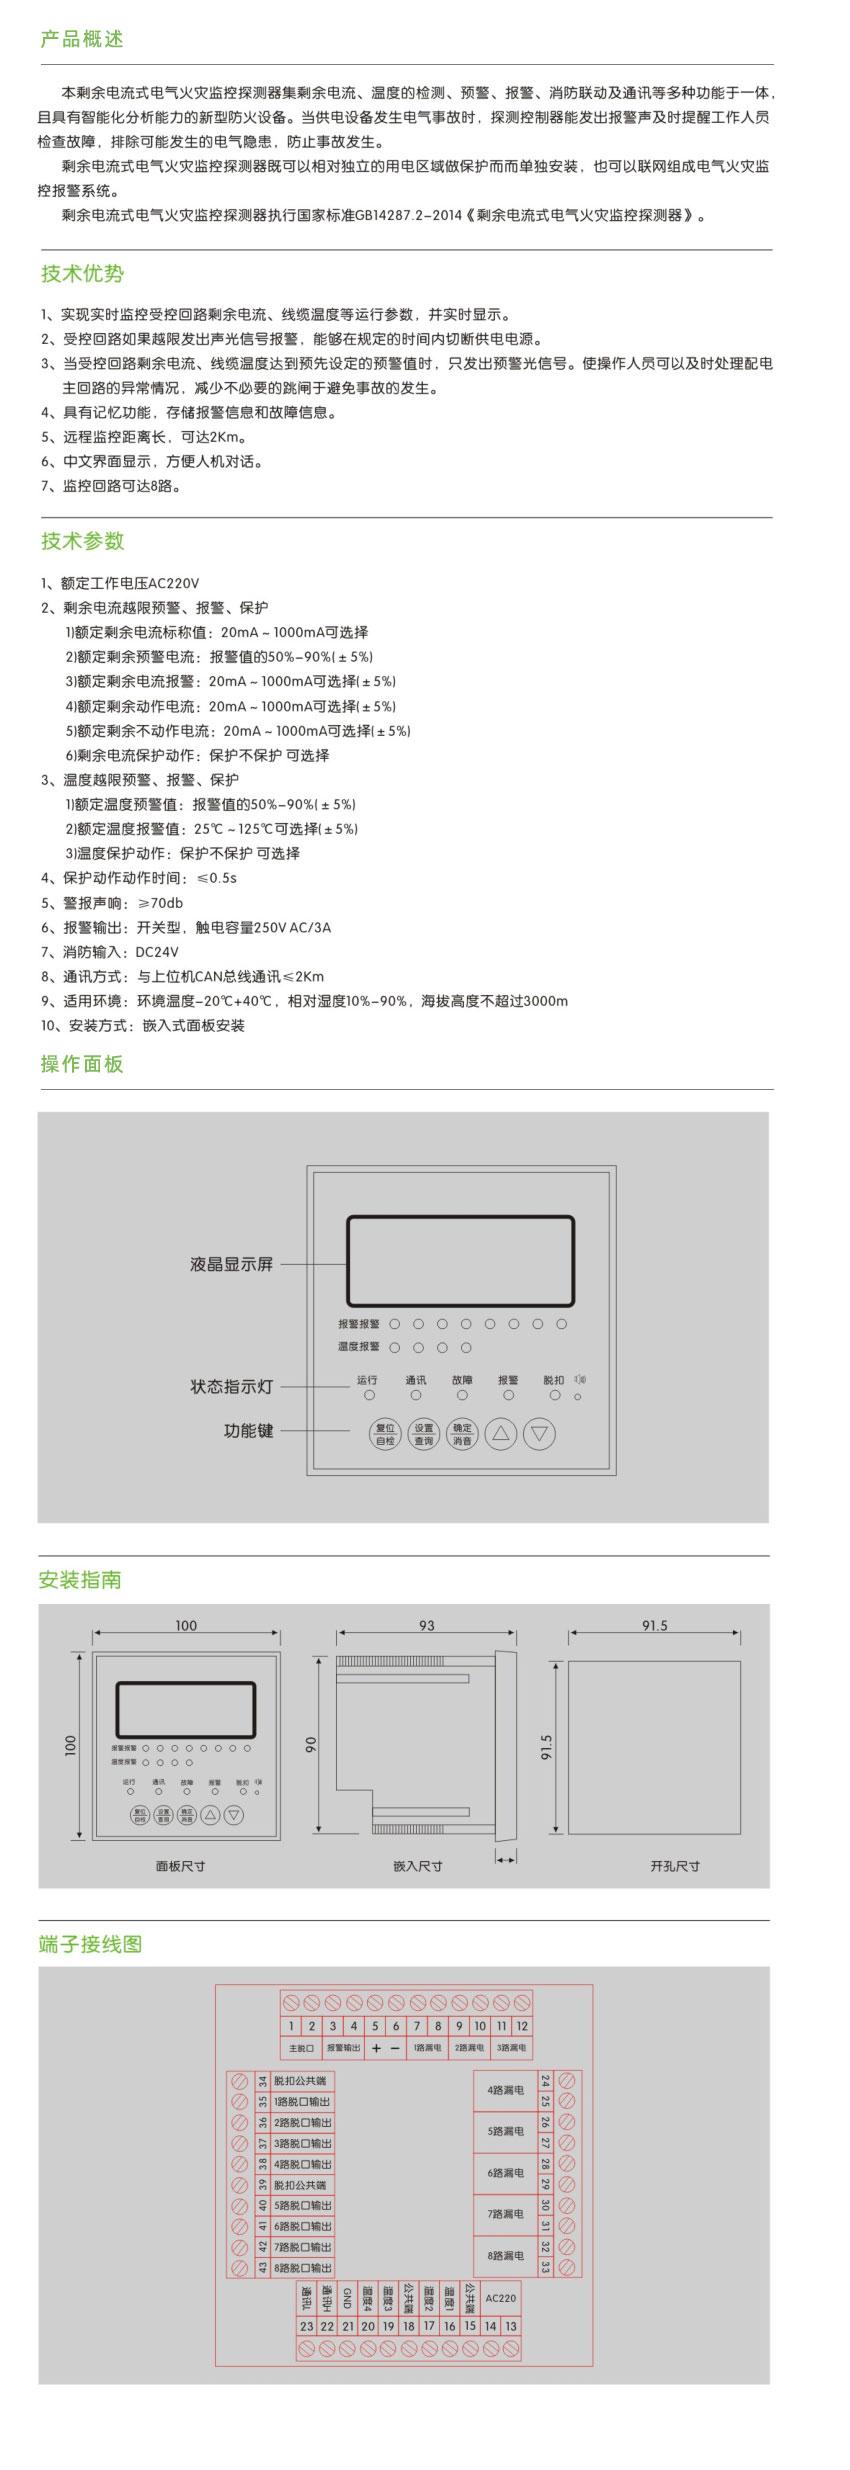 02_4_detail_HRLB-F(1-8路面板式液晶型).jpg